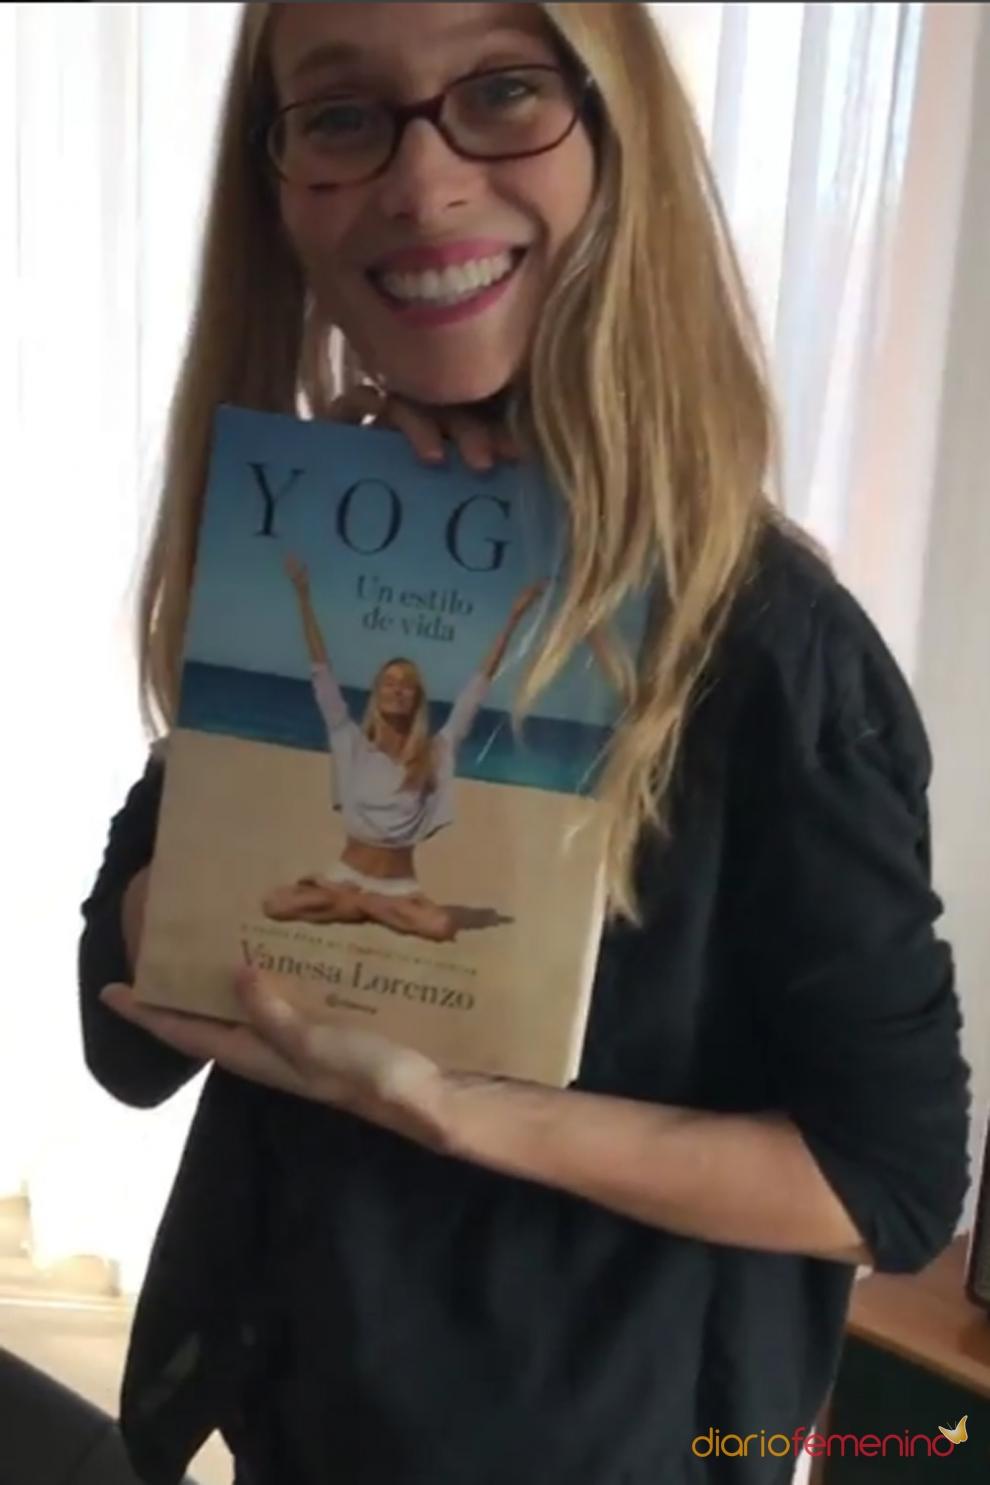 El libro de yoga de vanesa lorenzo for Instagram vanesa lorenzo